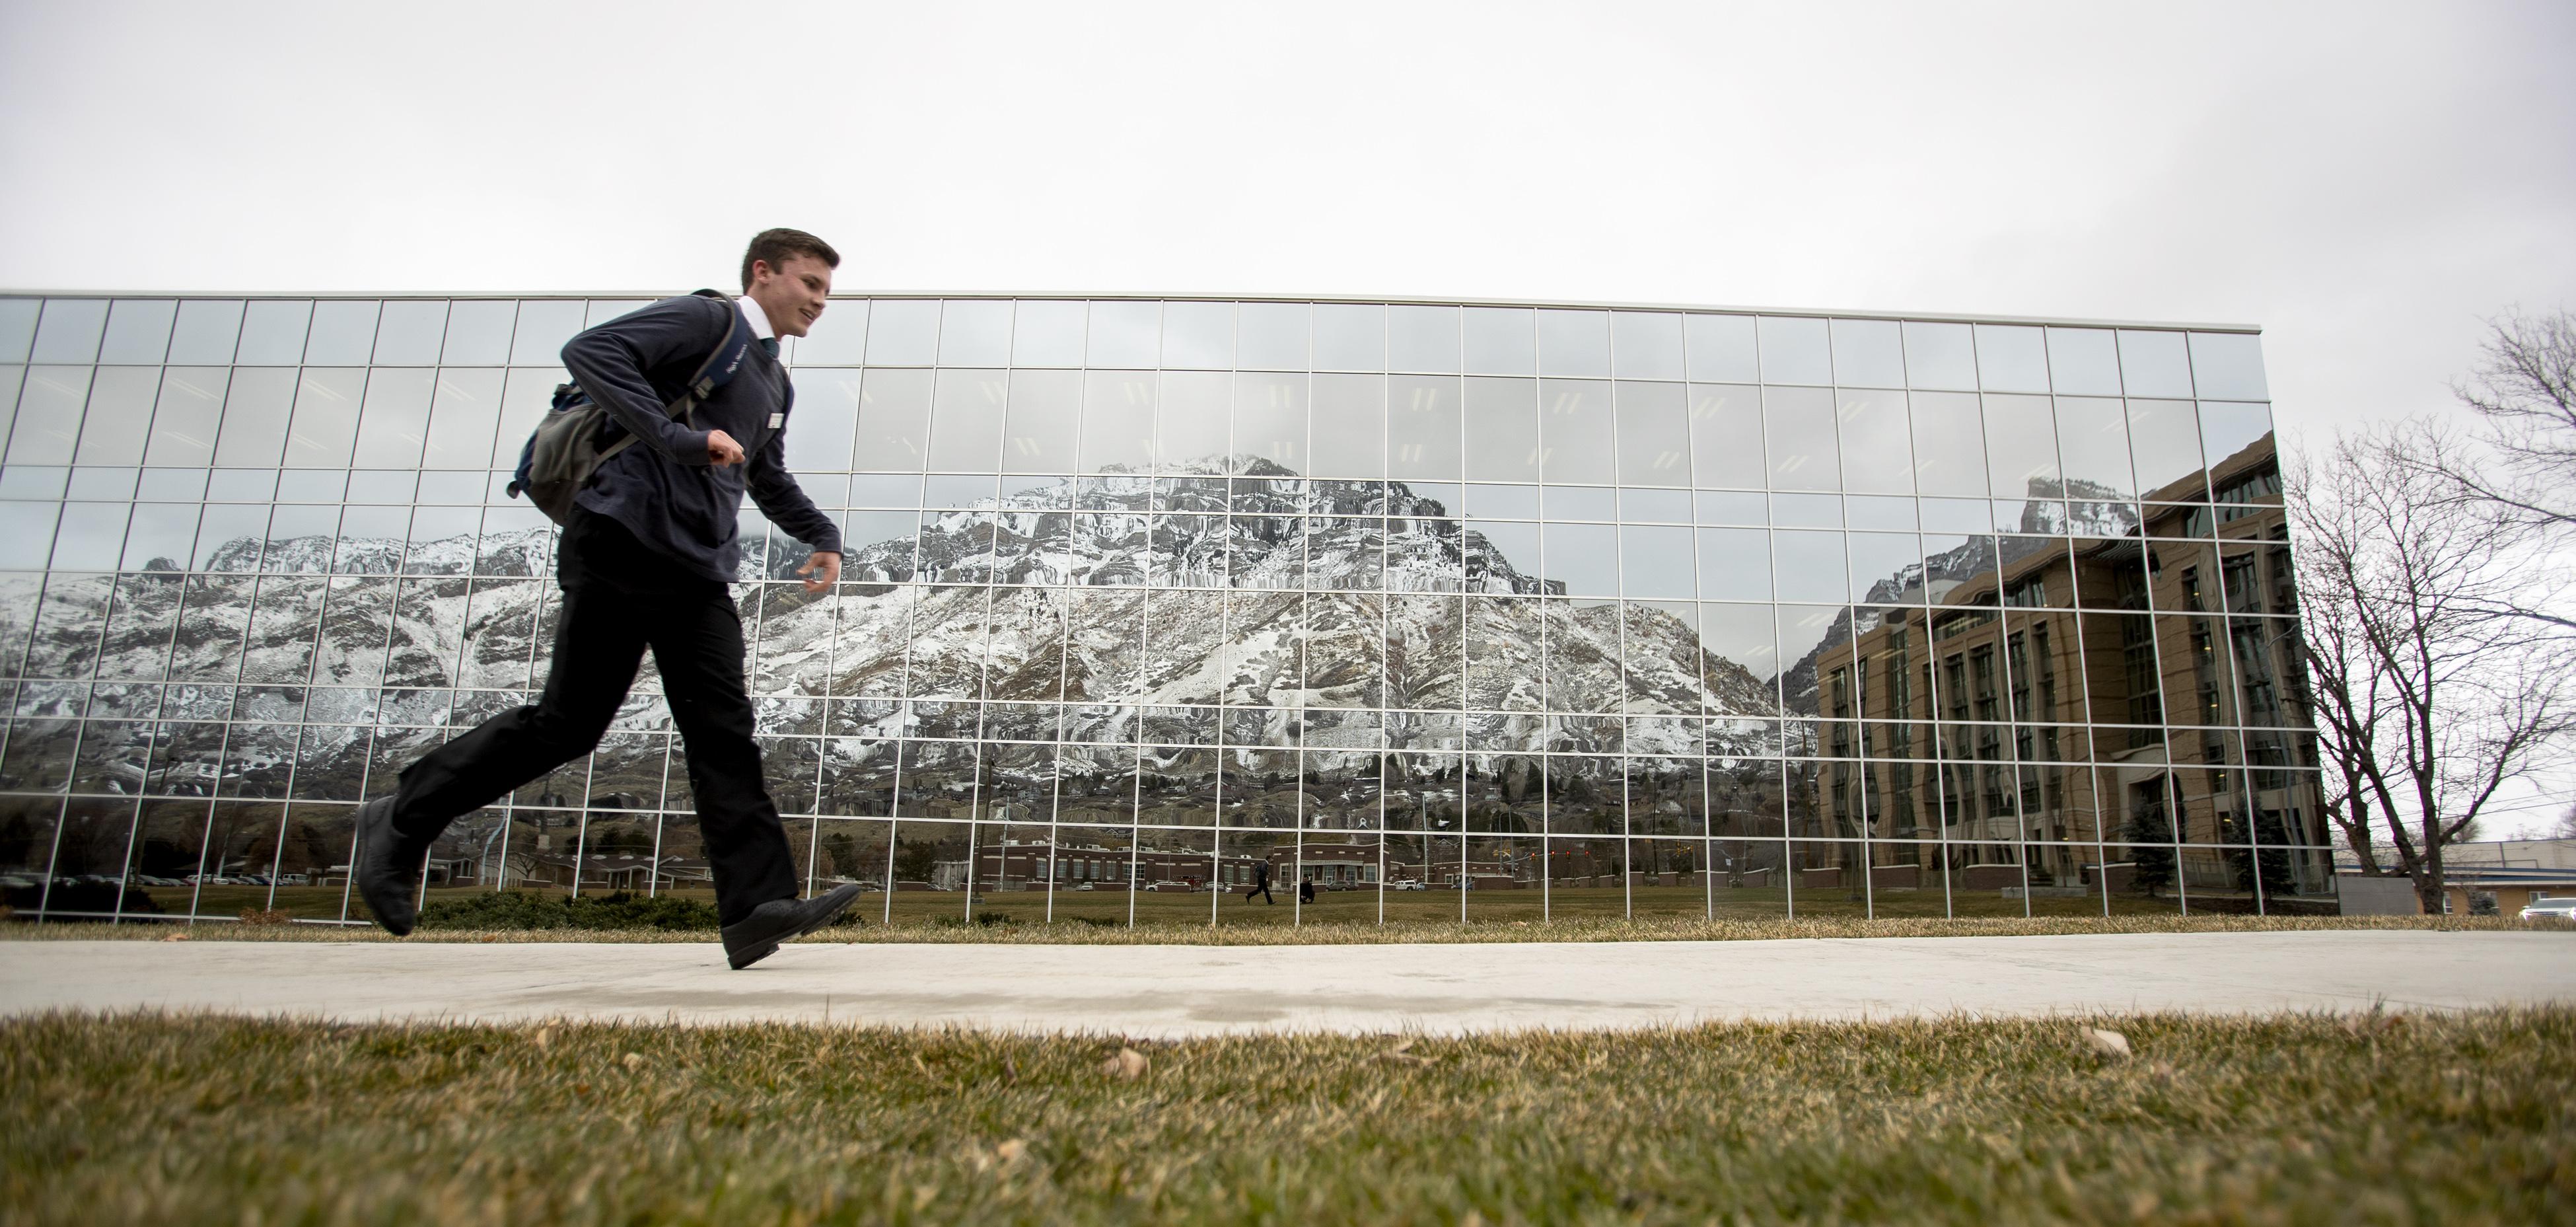 A student runs on the sidewalk past the Caroline Hemenway Harman Building at BYU in Provo, Utah, on Tuesday, Feb. 5, 2019.